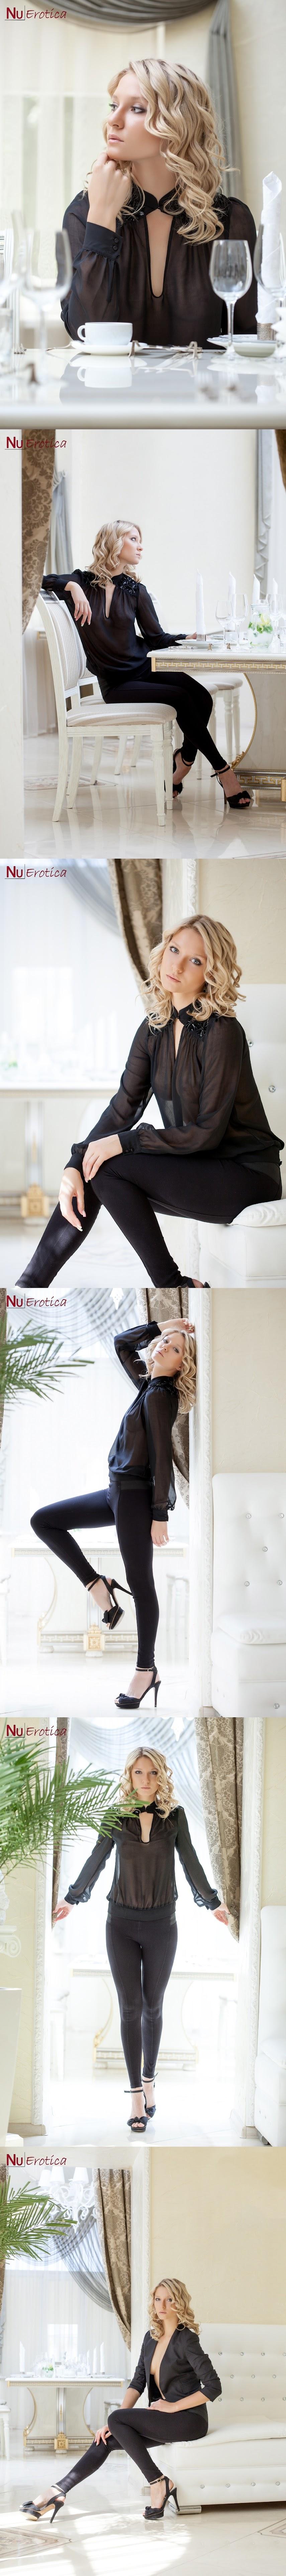 2015-02-01_Angela_Igoshina_-_Angela_In_Black_Sheer_Top.zip-jk- NuErotica 2015-02-01 Angela Igoshina - Angela In Black Sheer Top